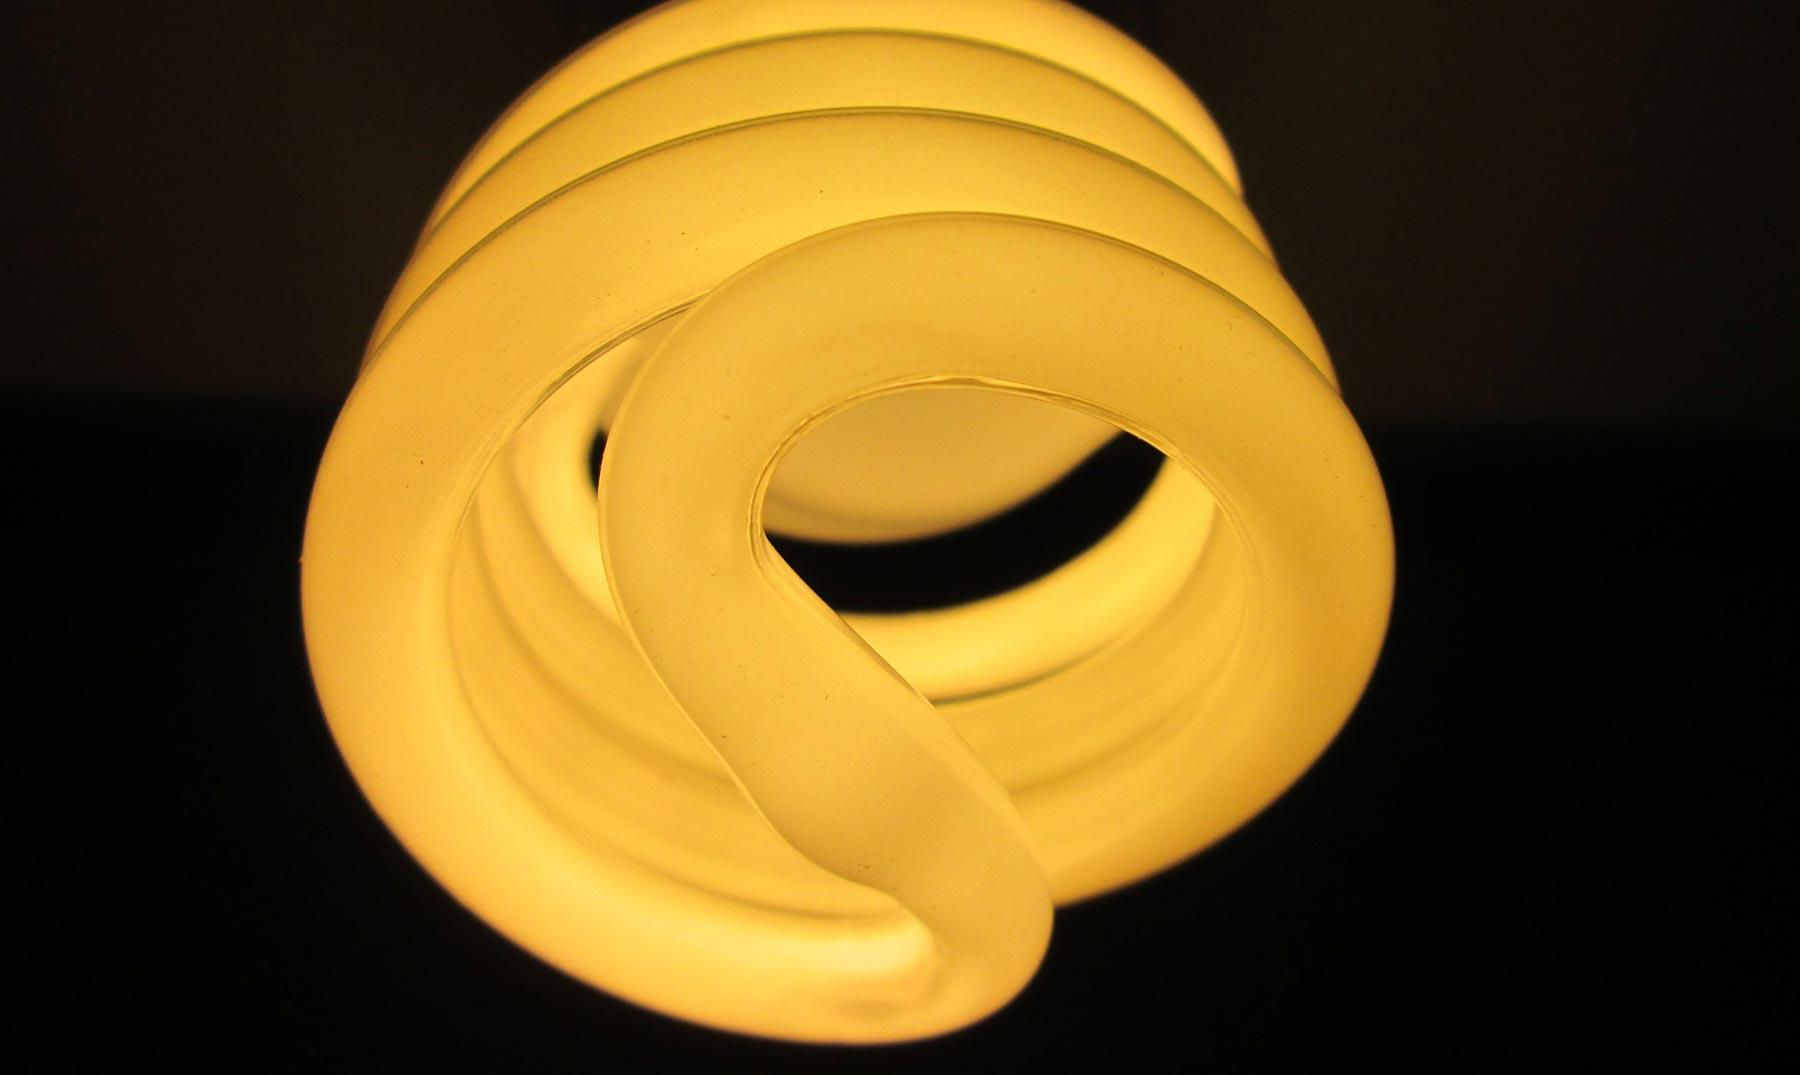 La revolución de las luces LED